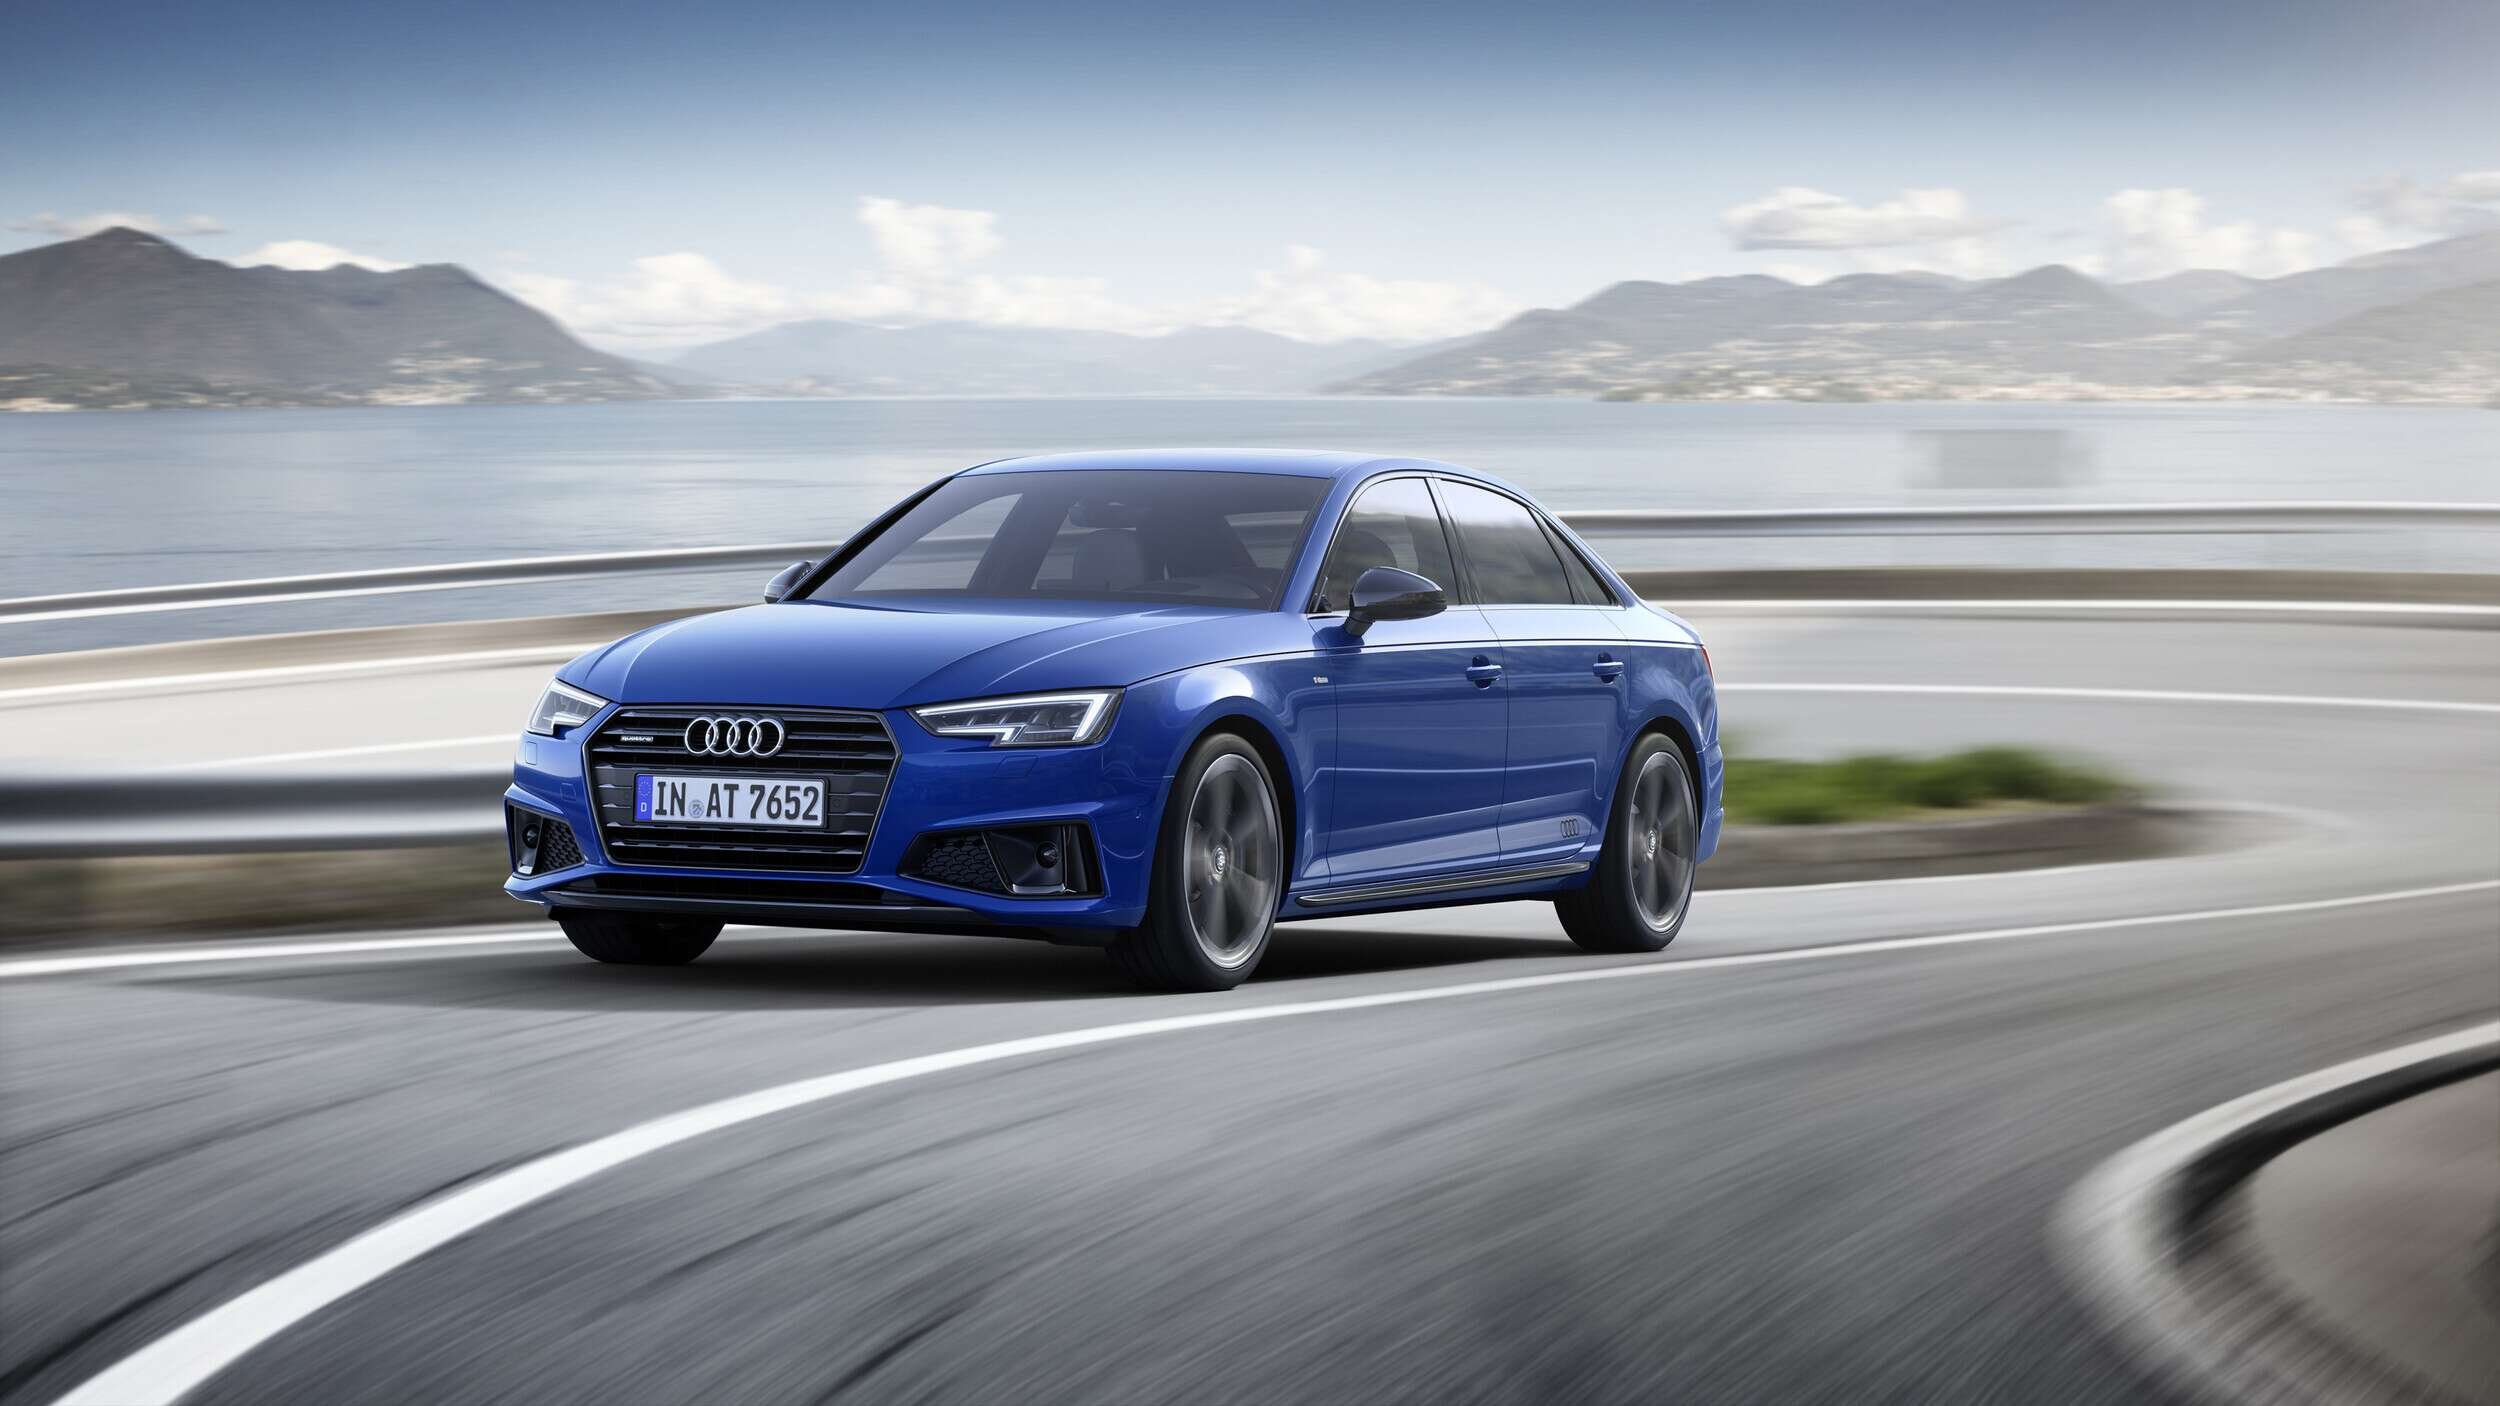 Inicia la preventa del Audi A4 en Colombia